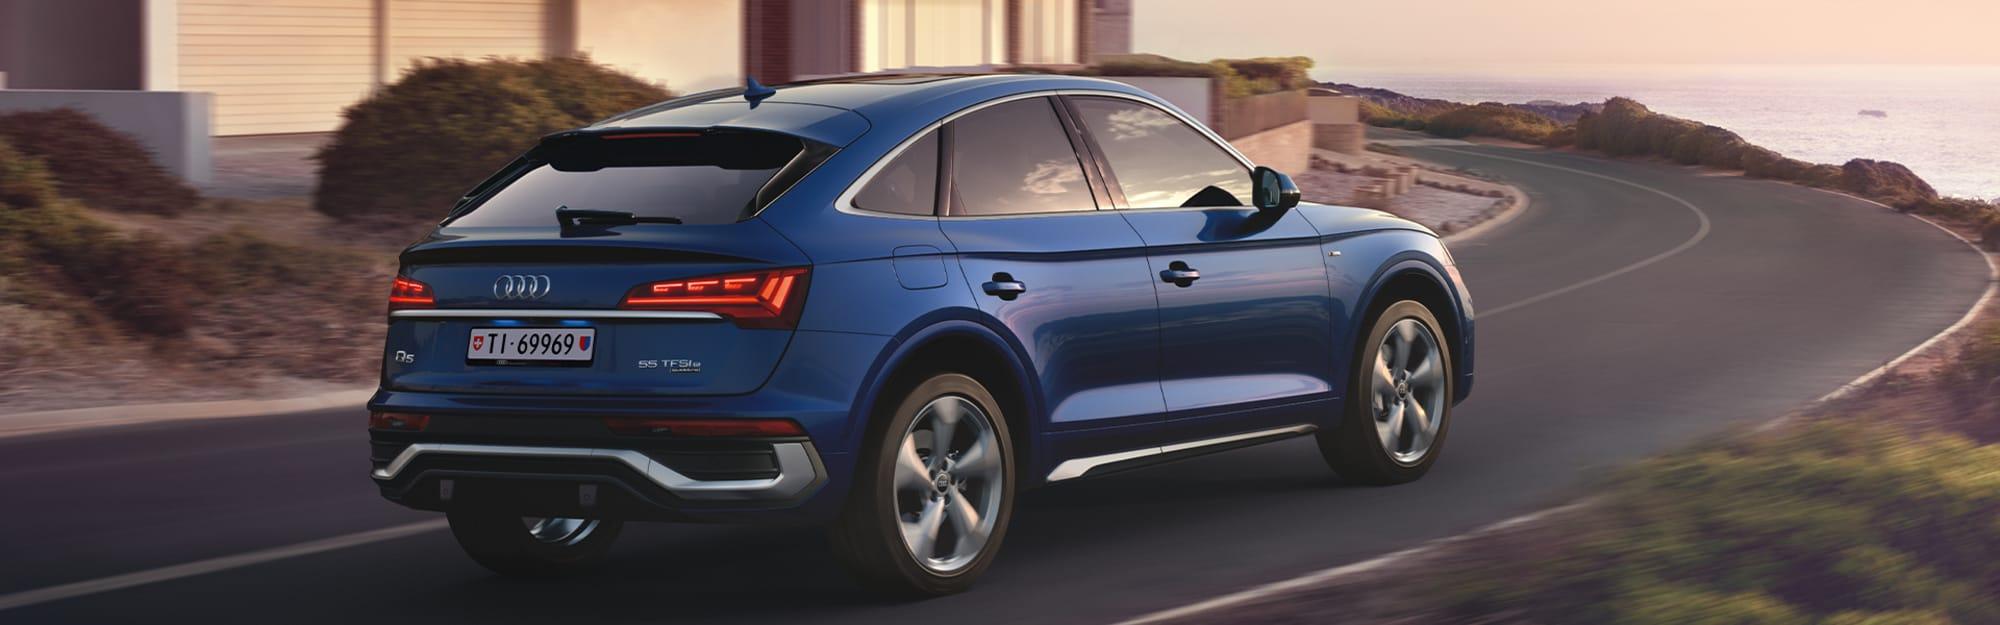 Audi_Q5SB_TFSIe_Fahrend_Haendlerwebseite_1920x600px_i